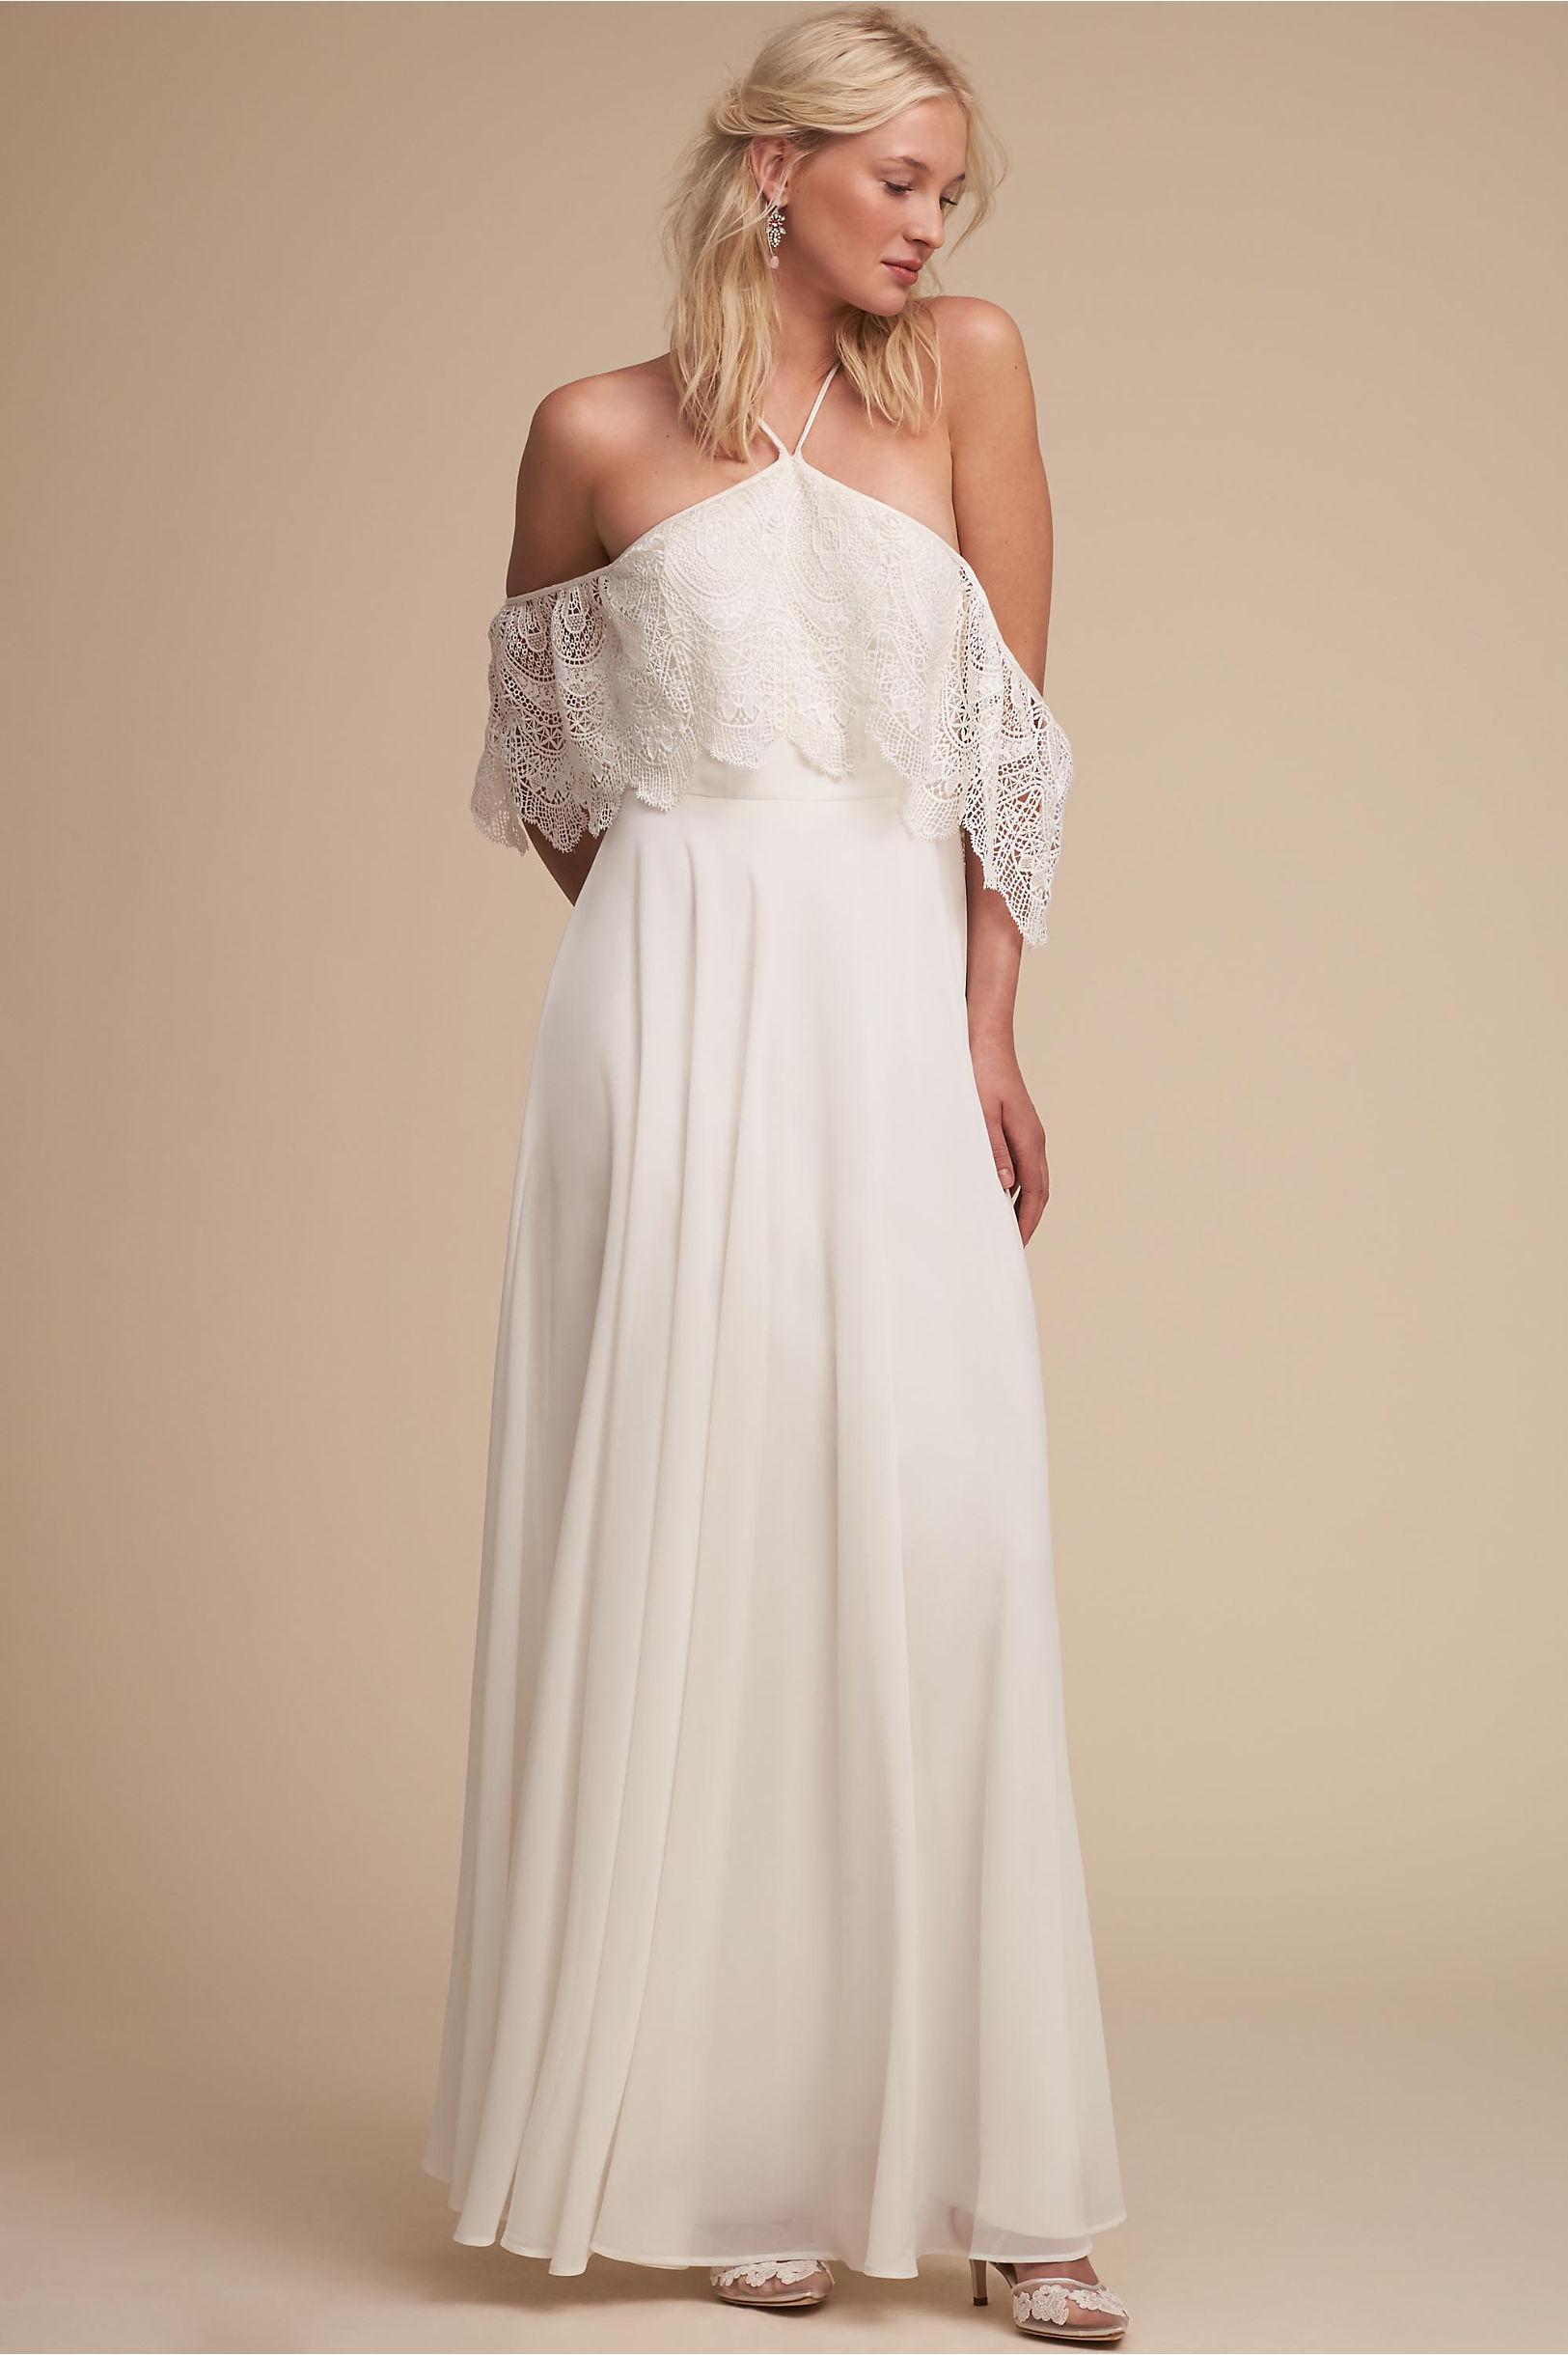 Pearson Dress Ivory in Bride | BHLDN